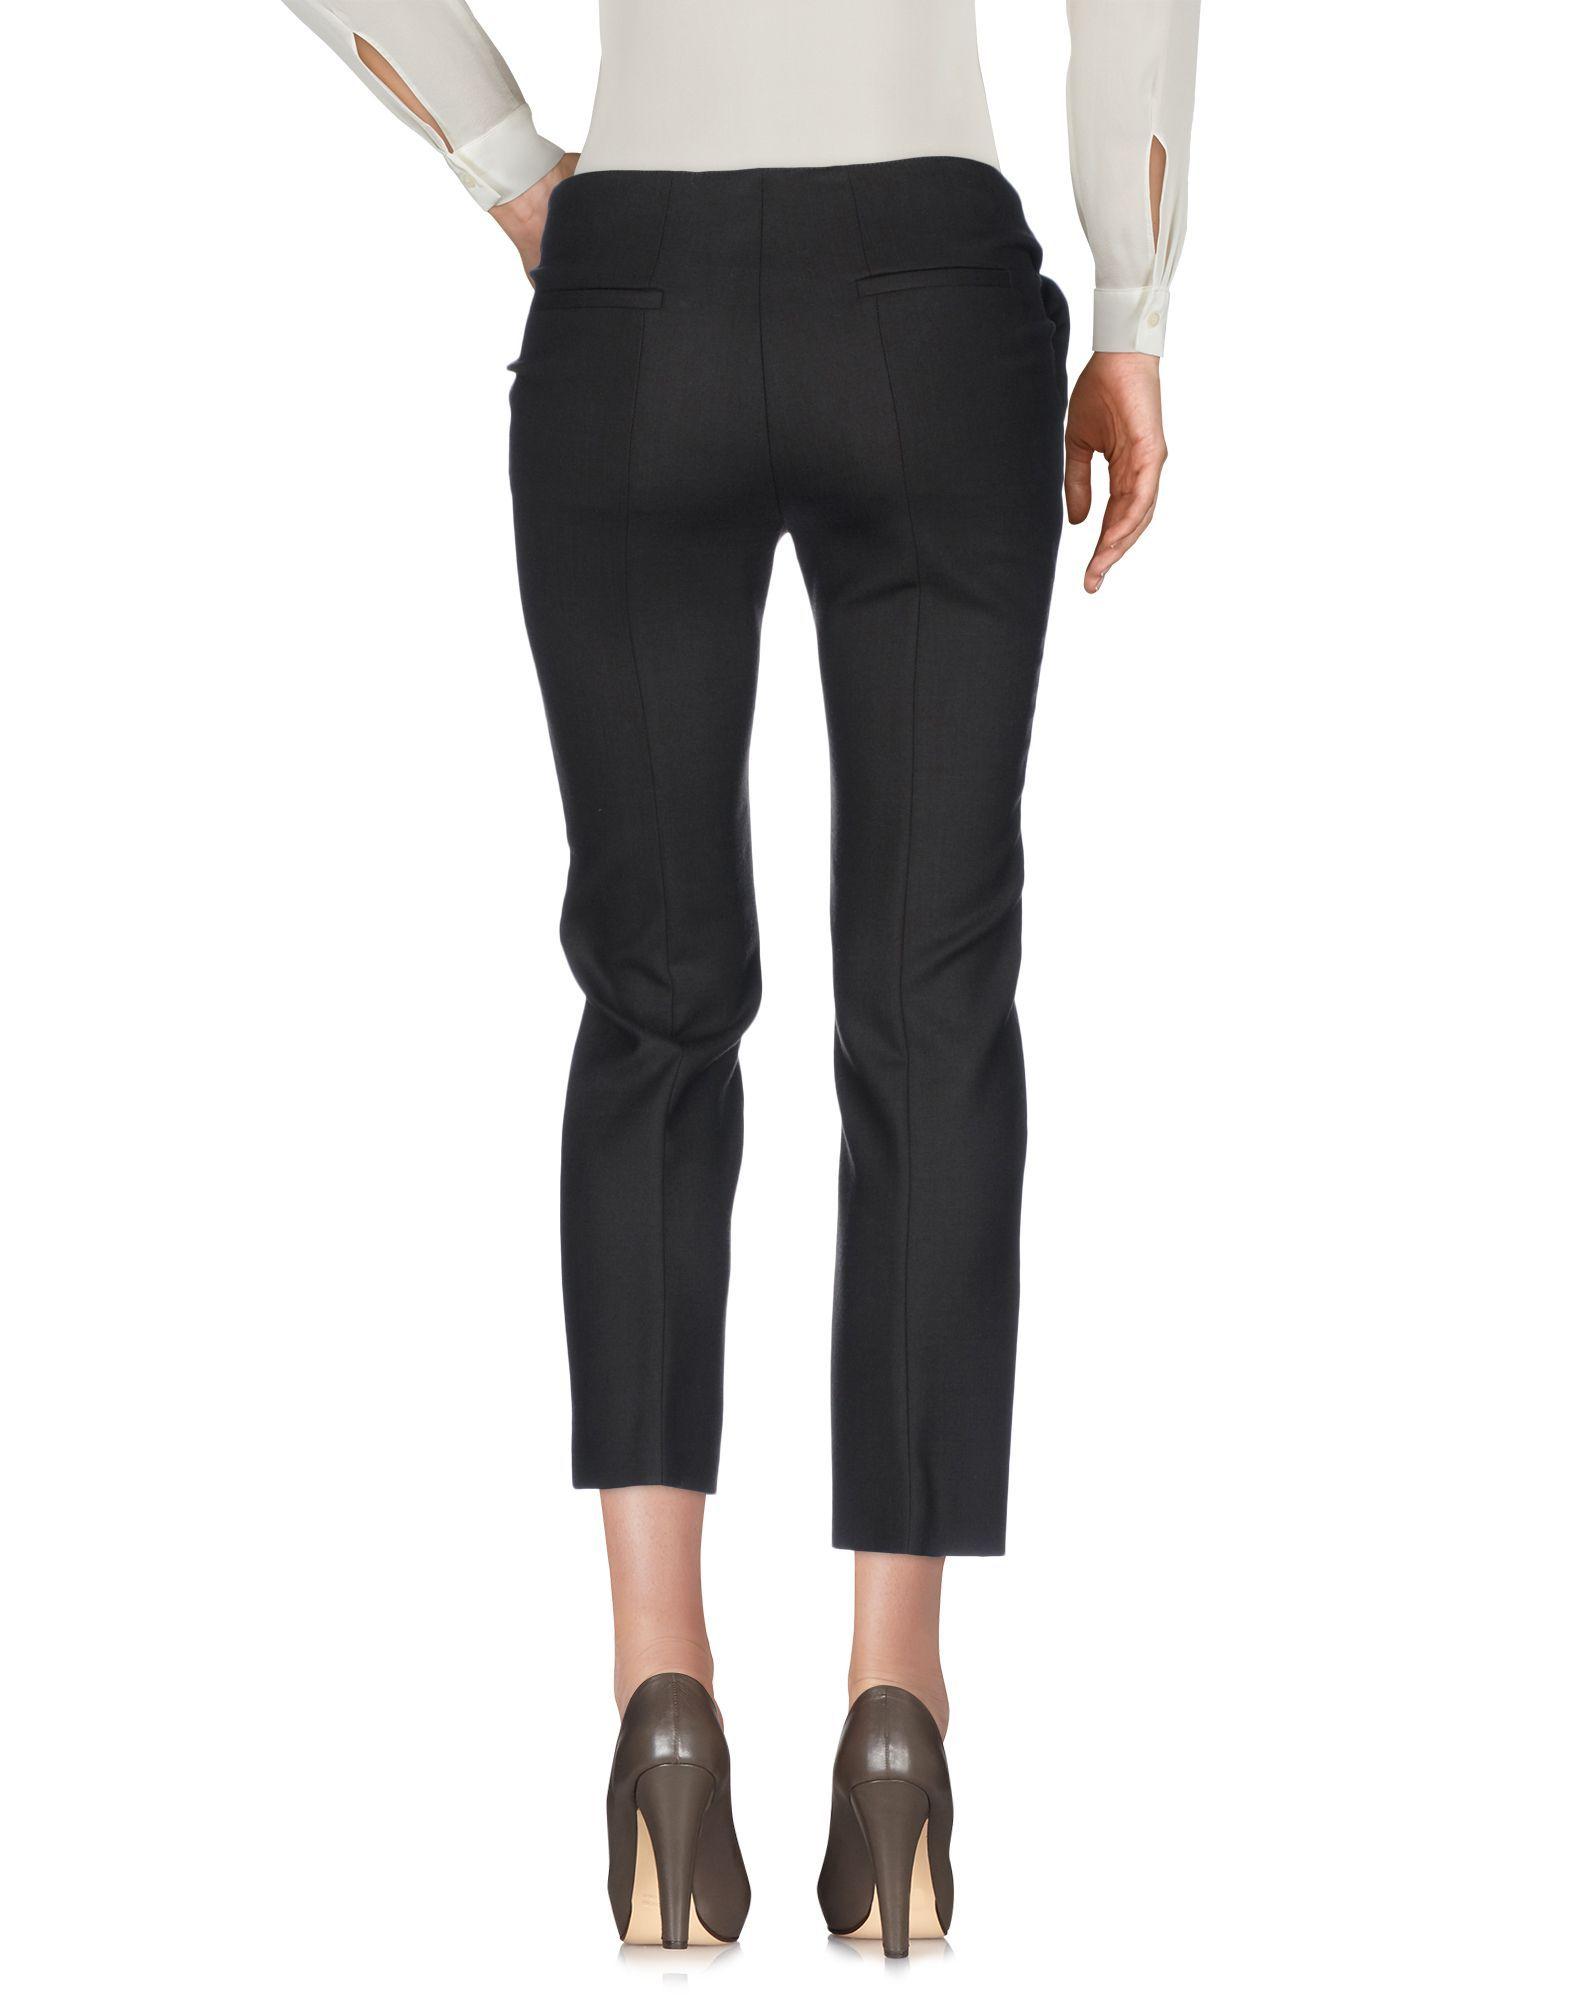 Miu Miu Dark Brown Virgin Wool Tailored Trousers